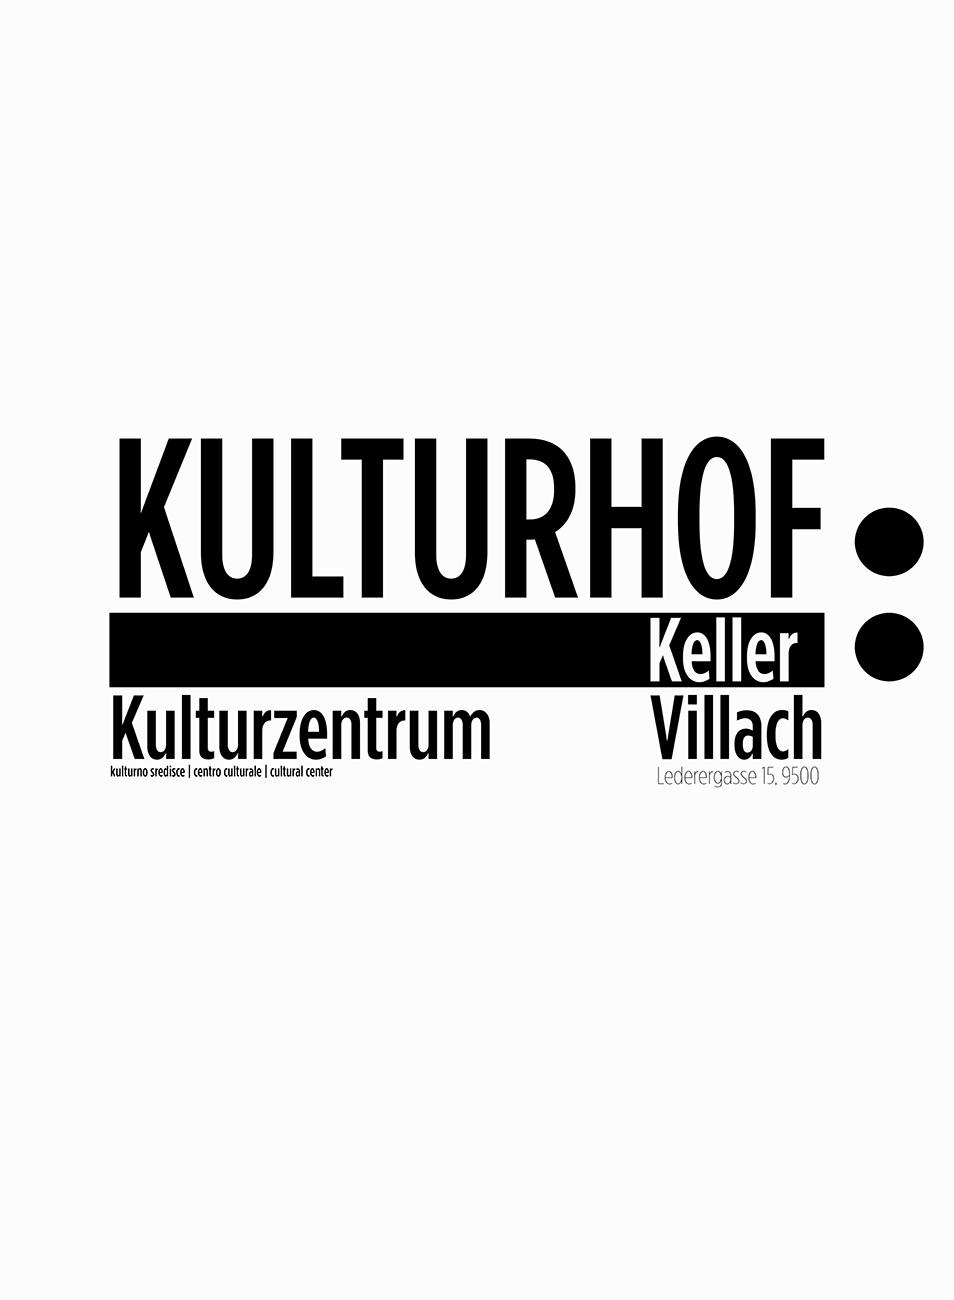 Kulturhofkeller